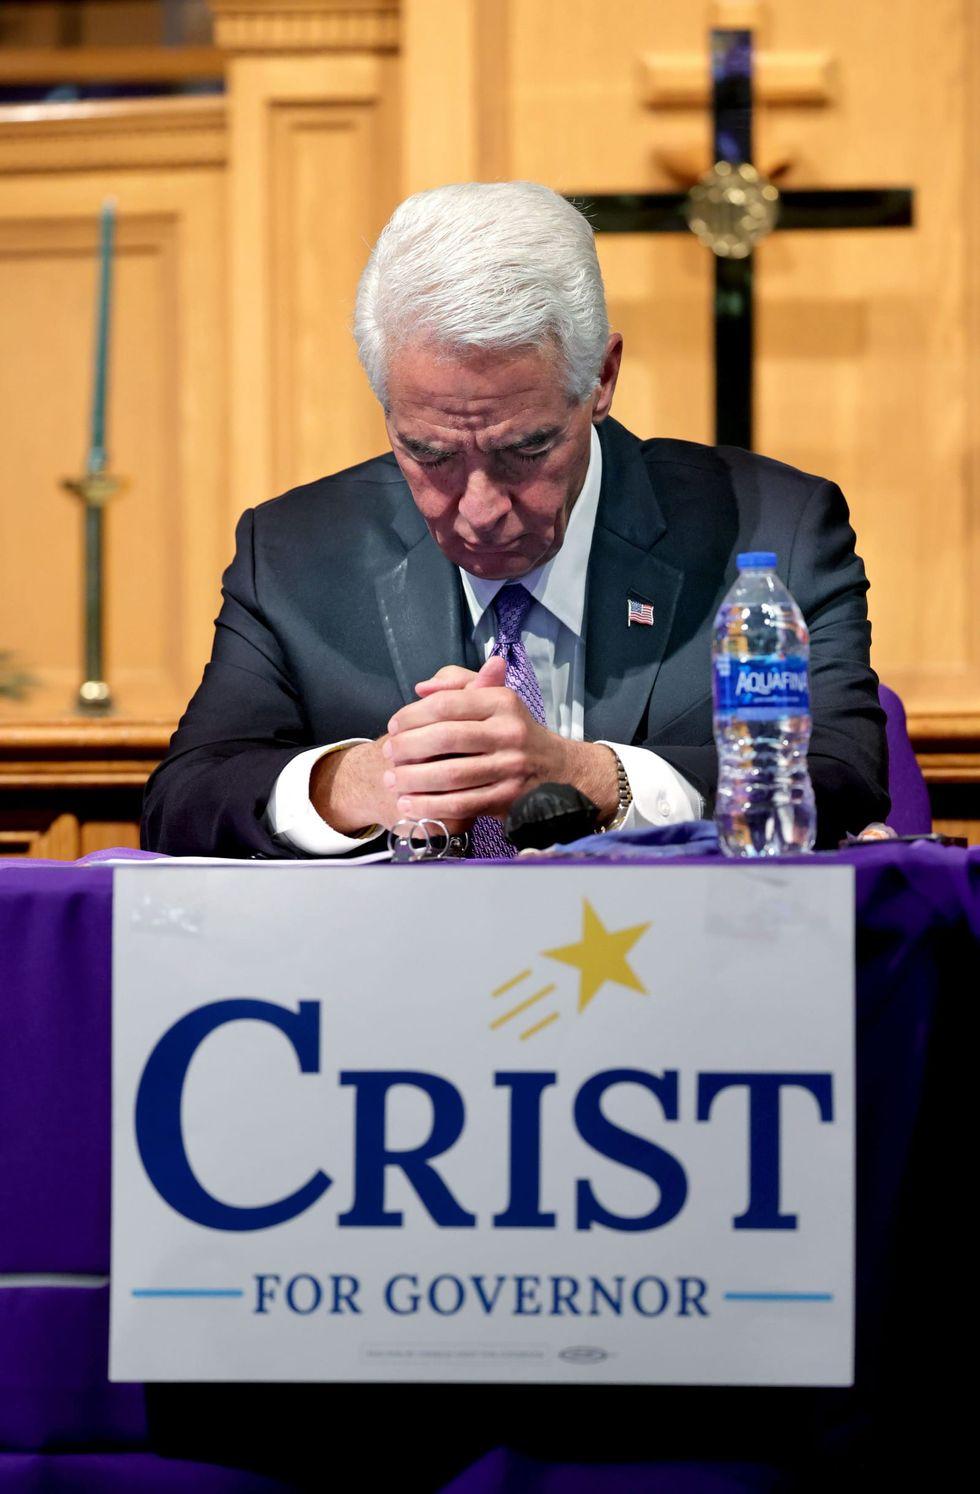 Crist touts justice reform for Florida, picks up key endorsement